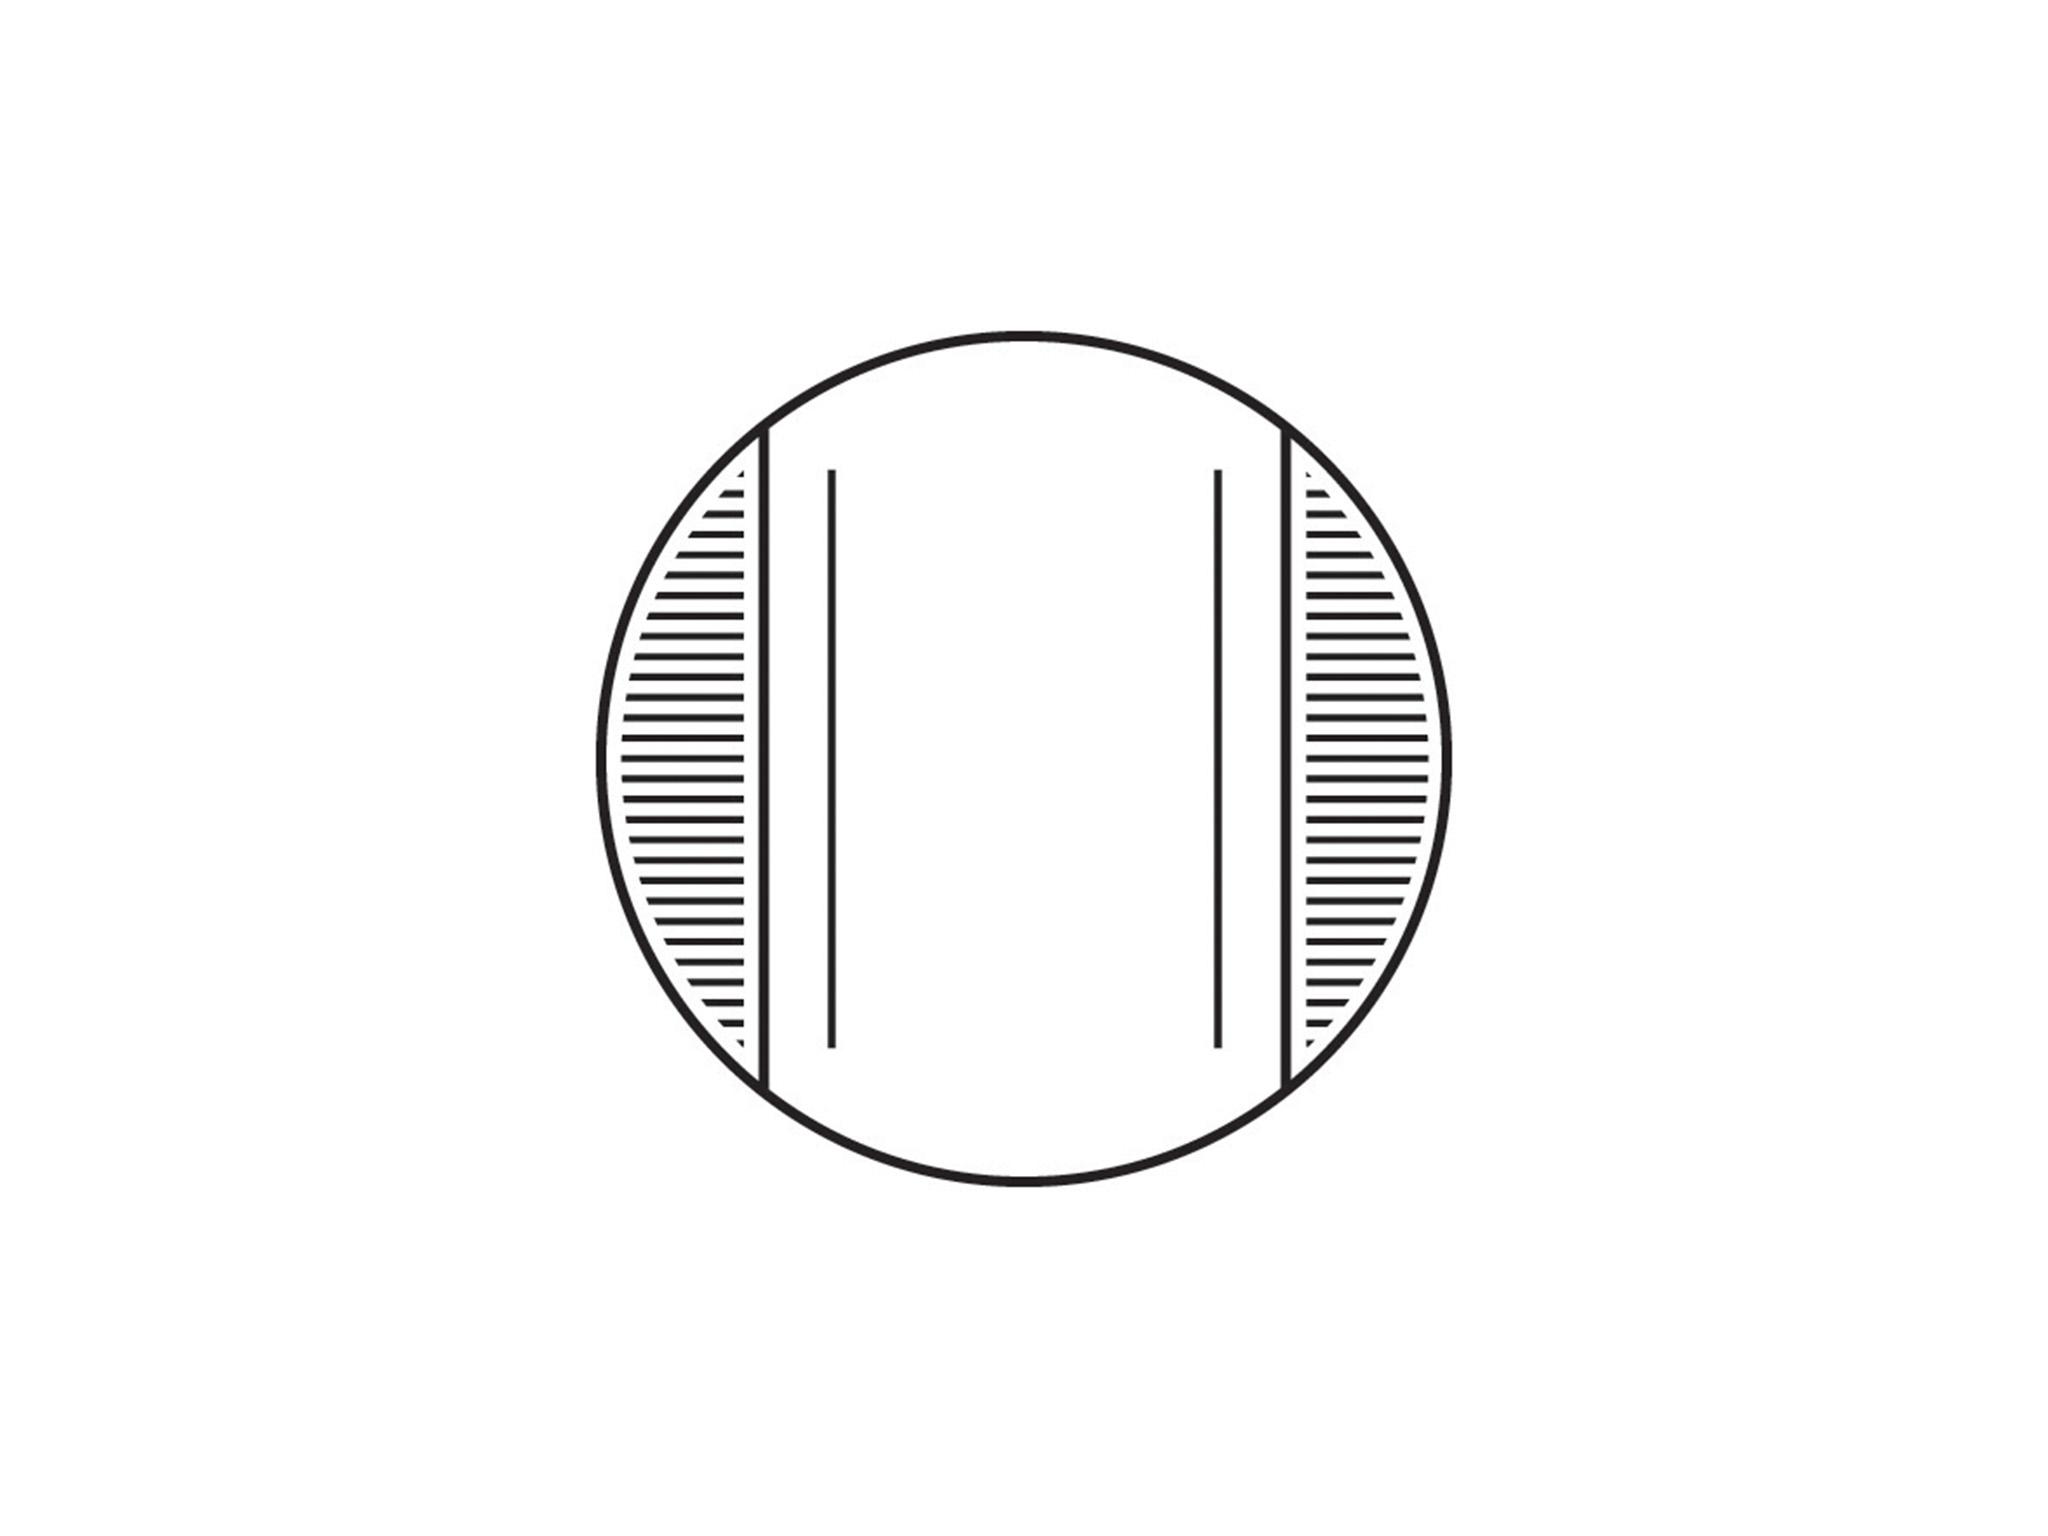 apex_letters_horizontal_large_0025_2_final_alphabet coasters-15.jpg